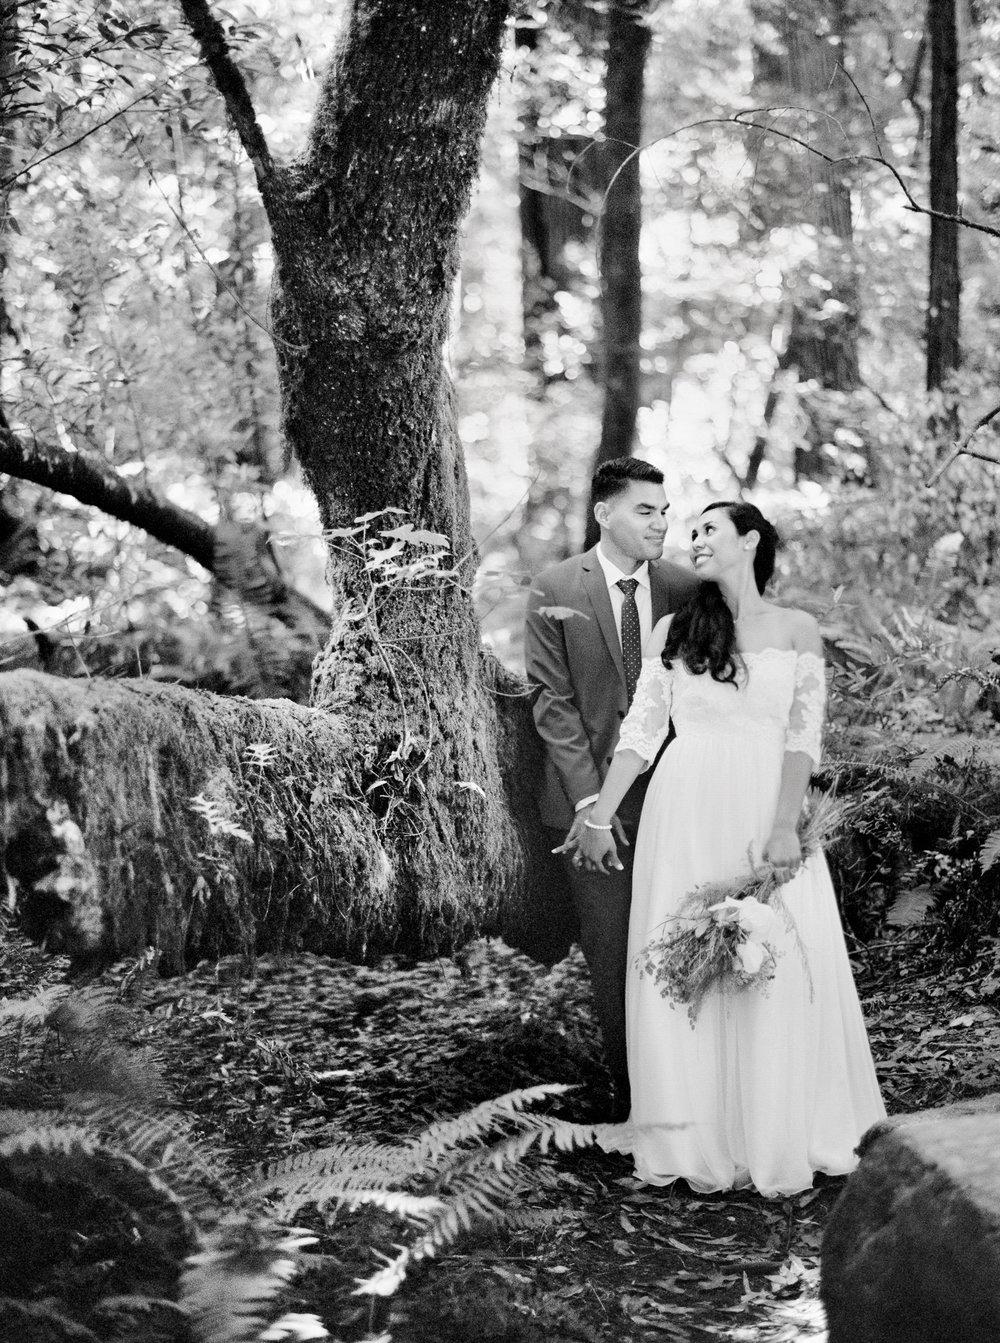 055Wedding+Photo+Video+Company+Luxuary+Weddings+Adventurour+Elopements.jpg